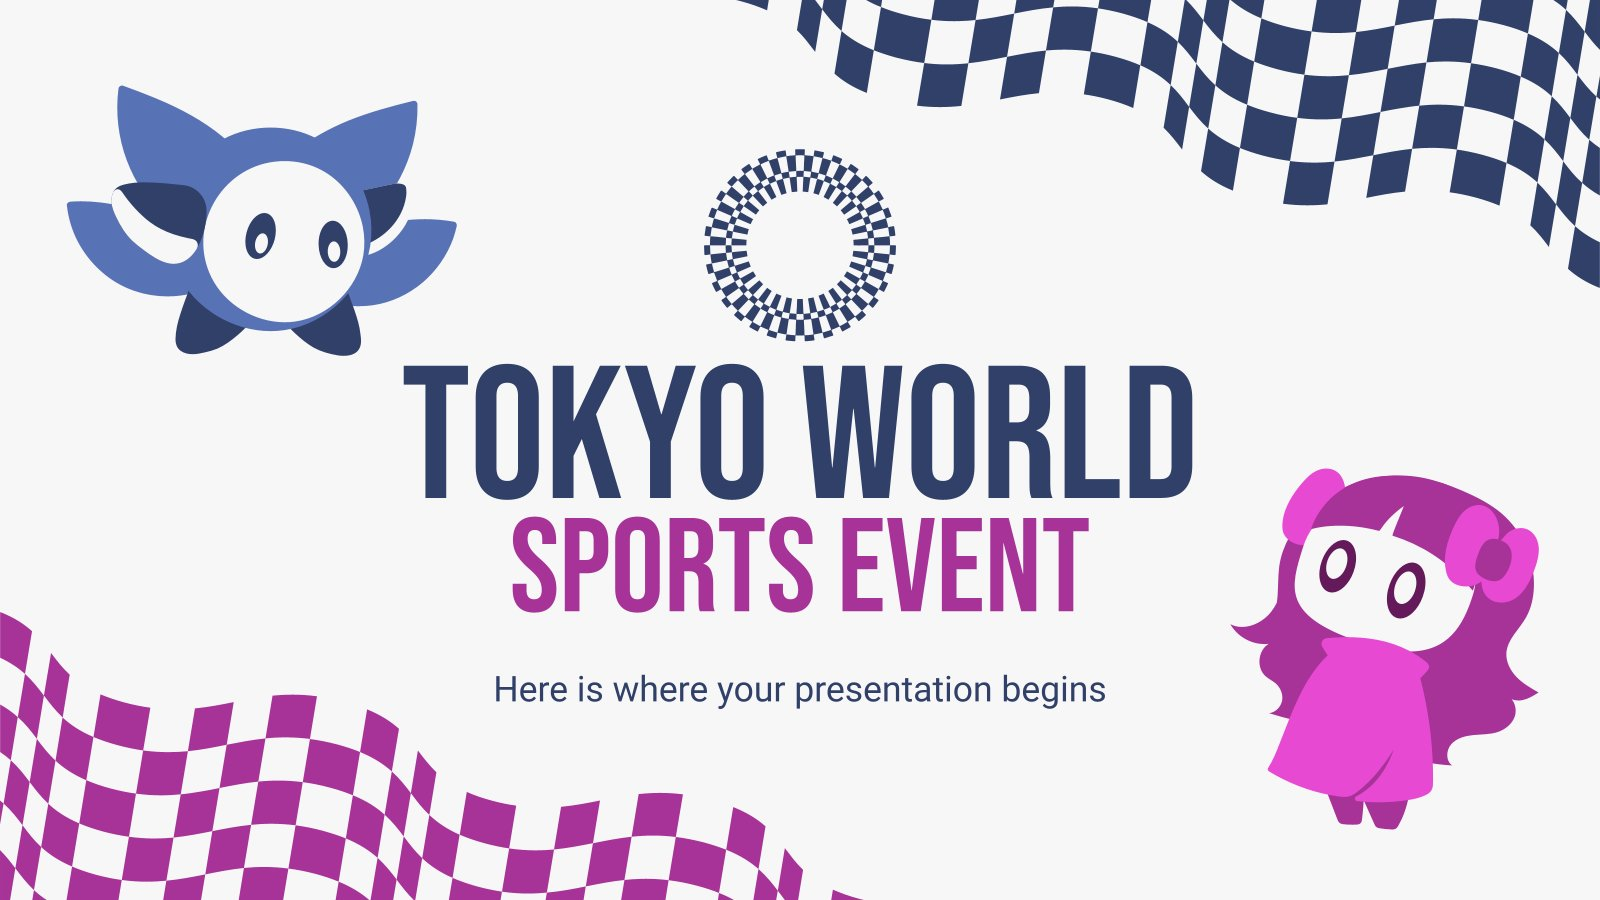 Plantilla de presentación Evento deportivo mundial en Tokio